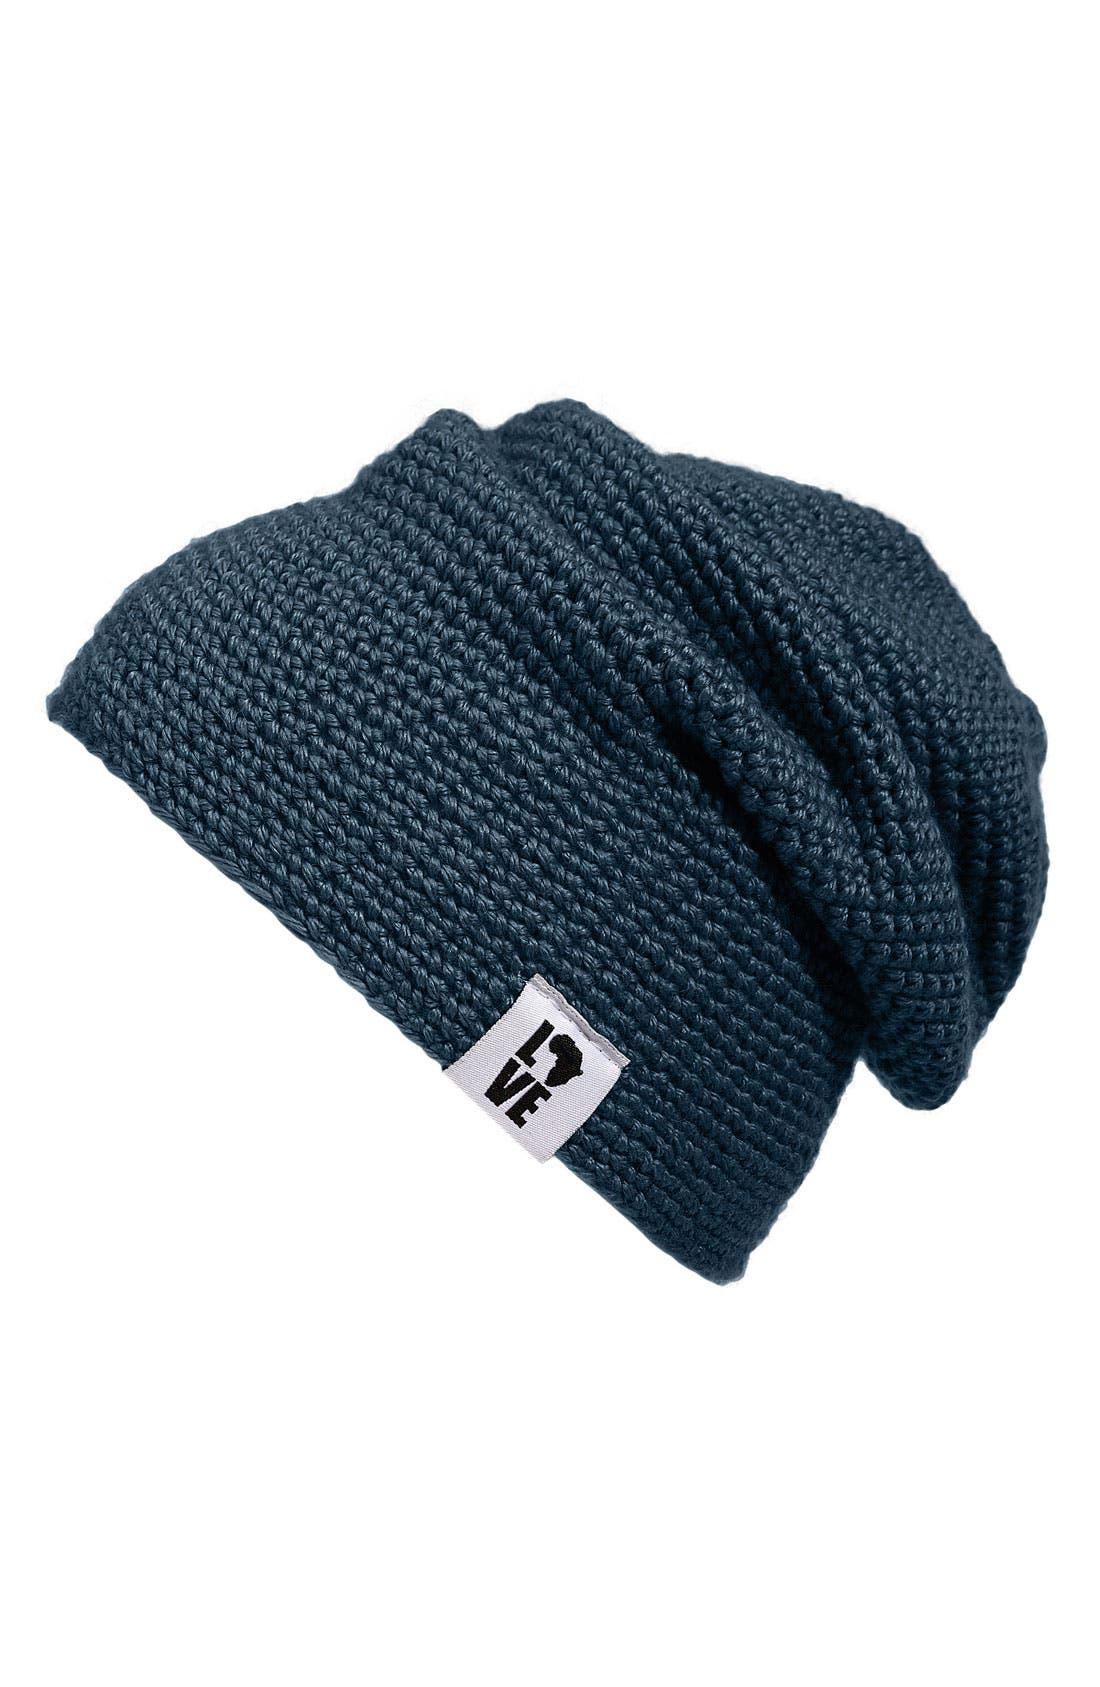 Main Image - Krochet Kids '5207.5' Hand Crochet Slouchy Beanie